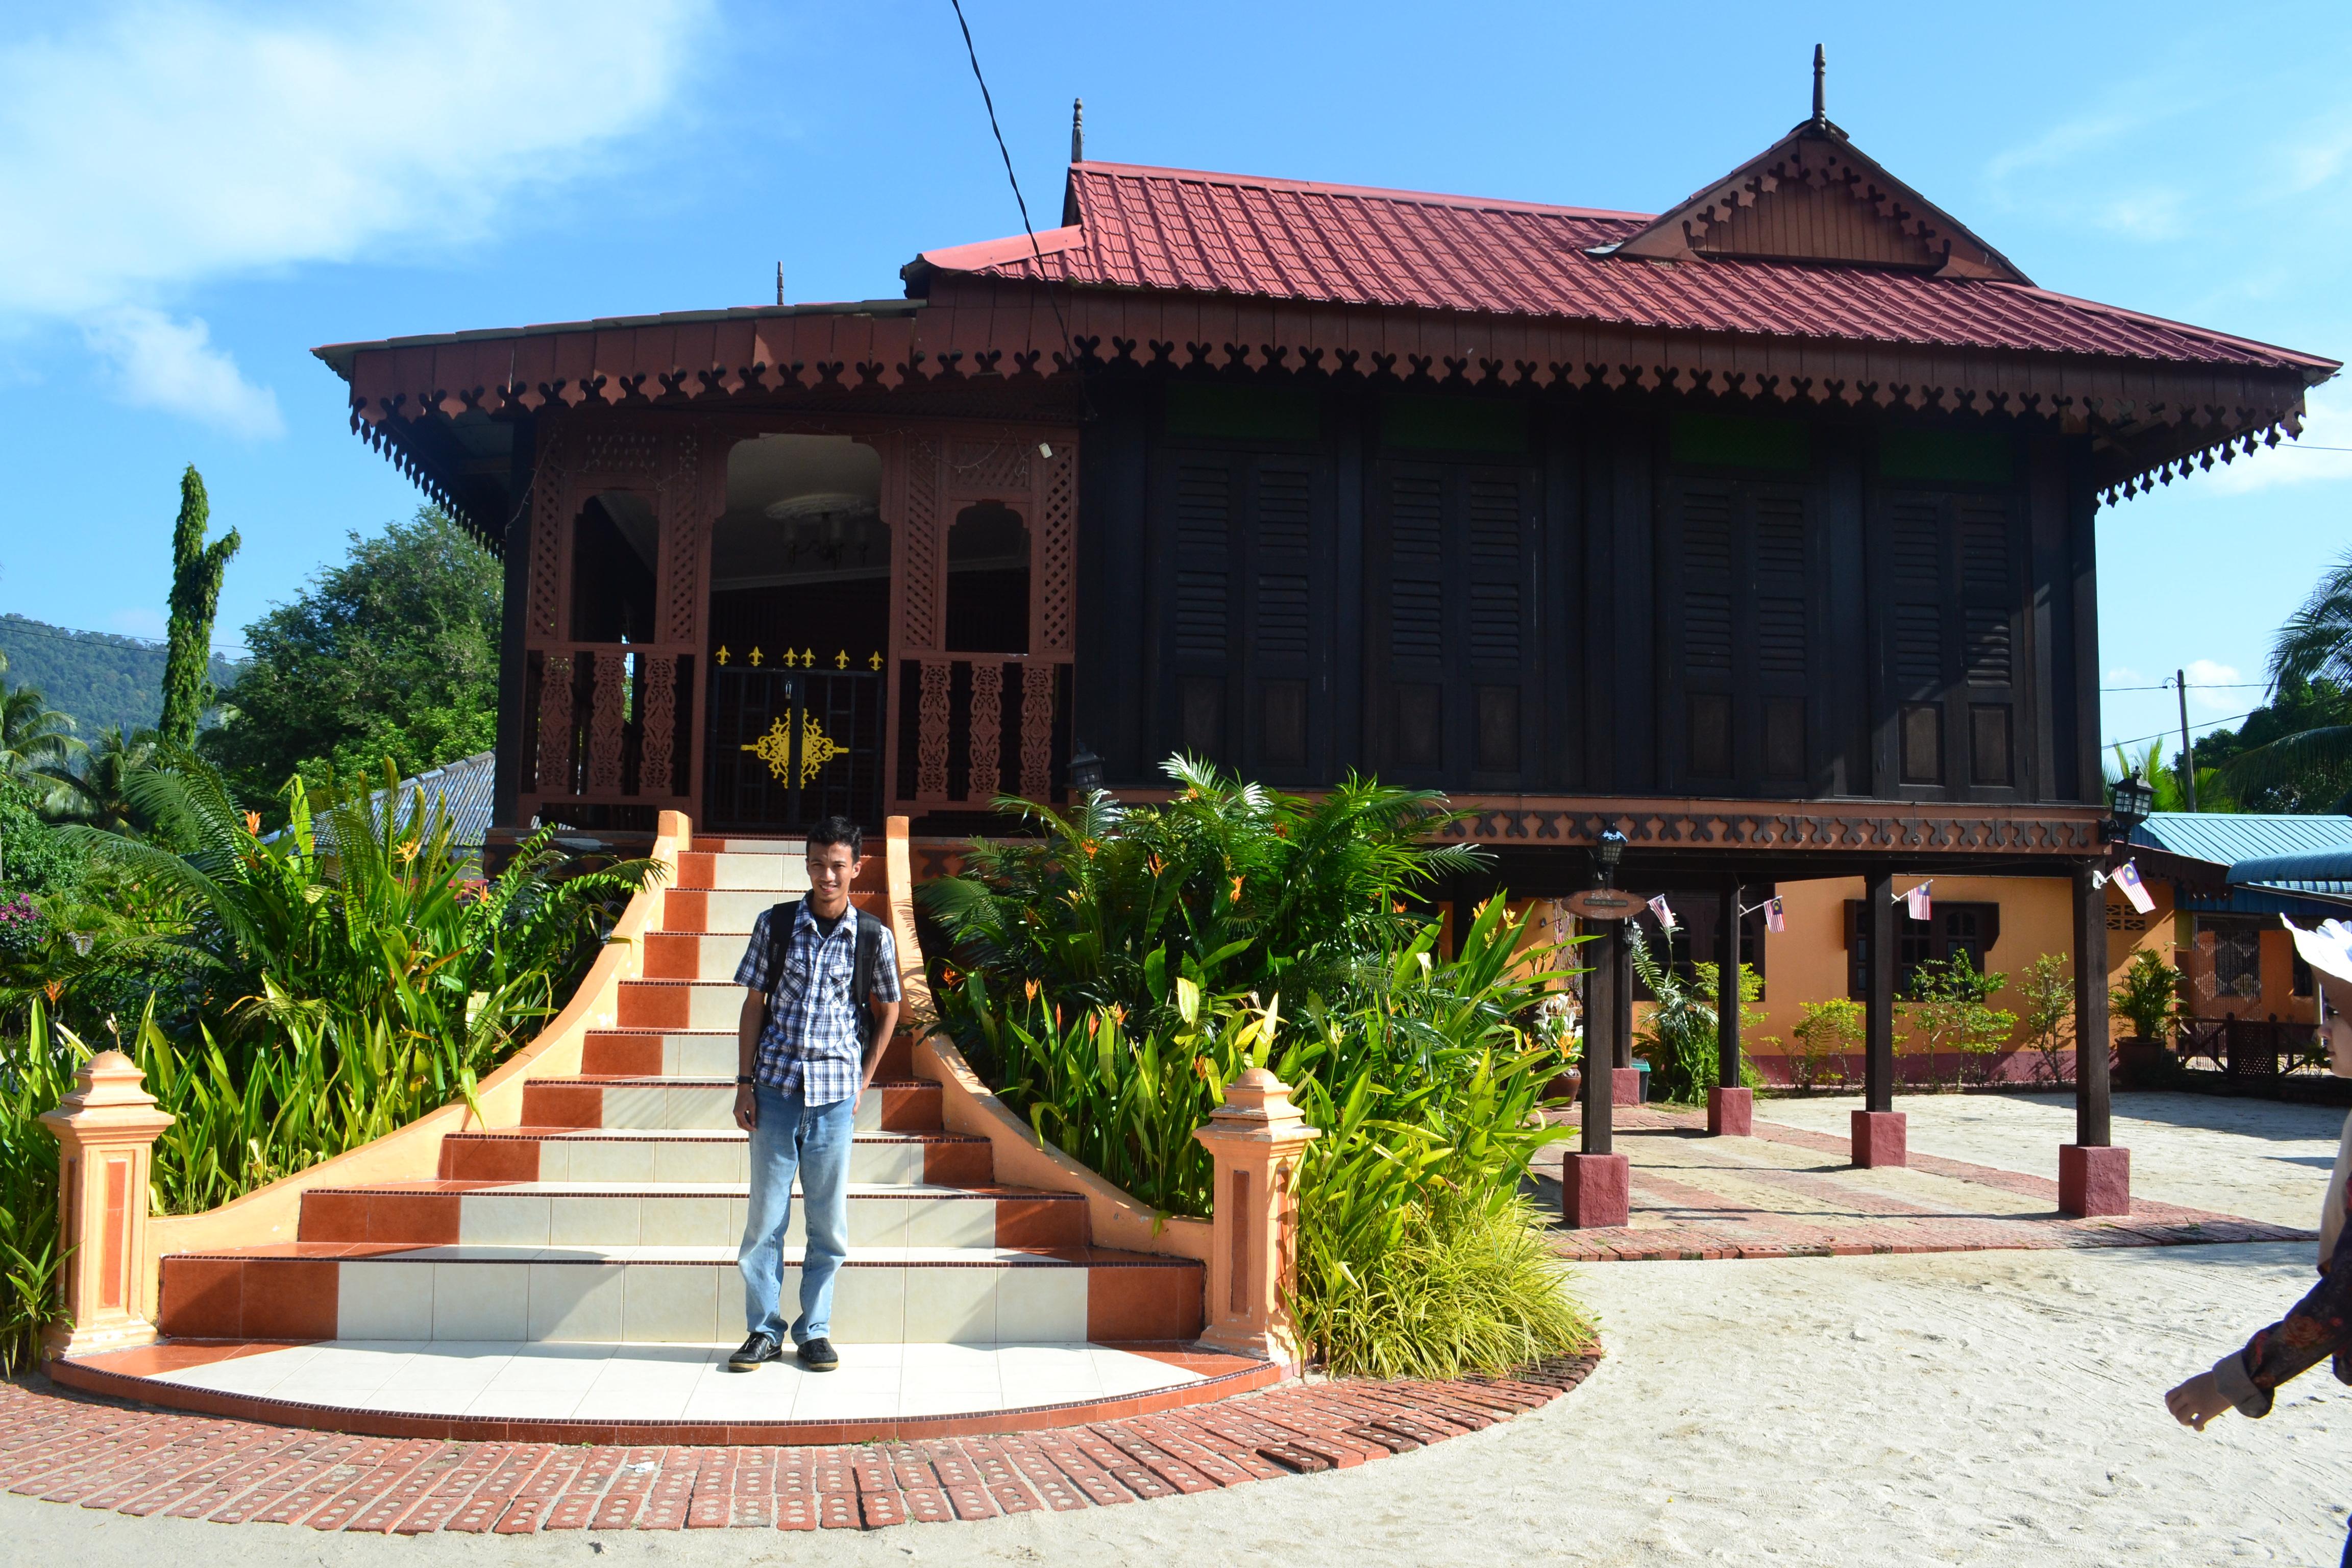 File Rumah Tradisional Melayu Jpg Wikimedia Commons